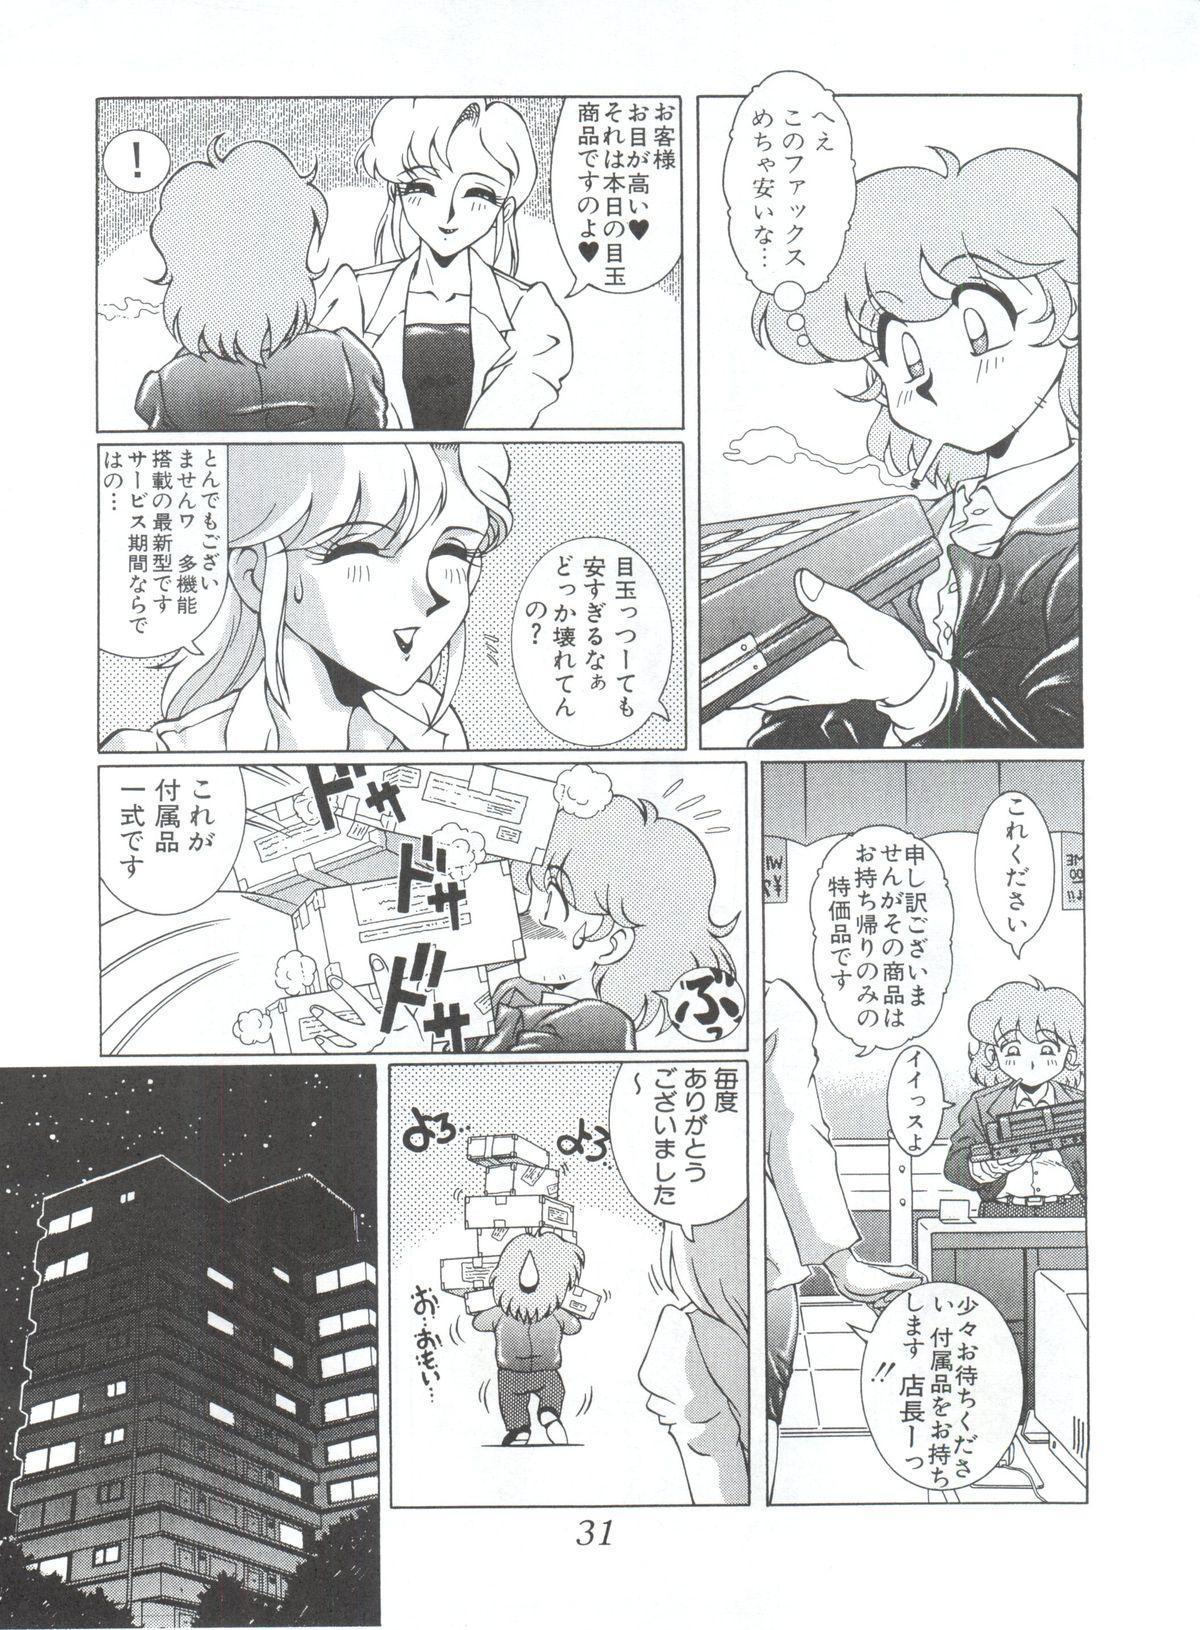 Meika Azumaya Vol.4 29